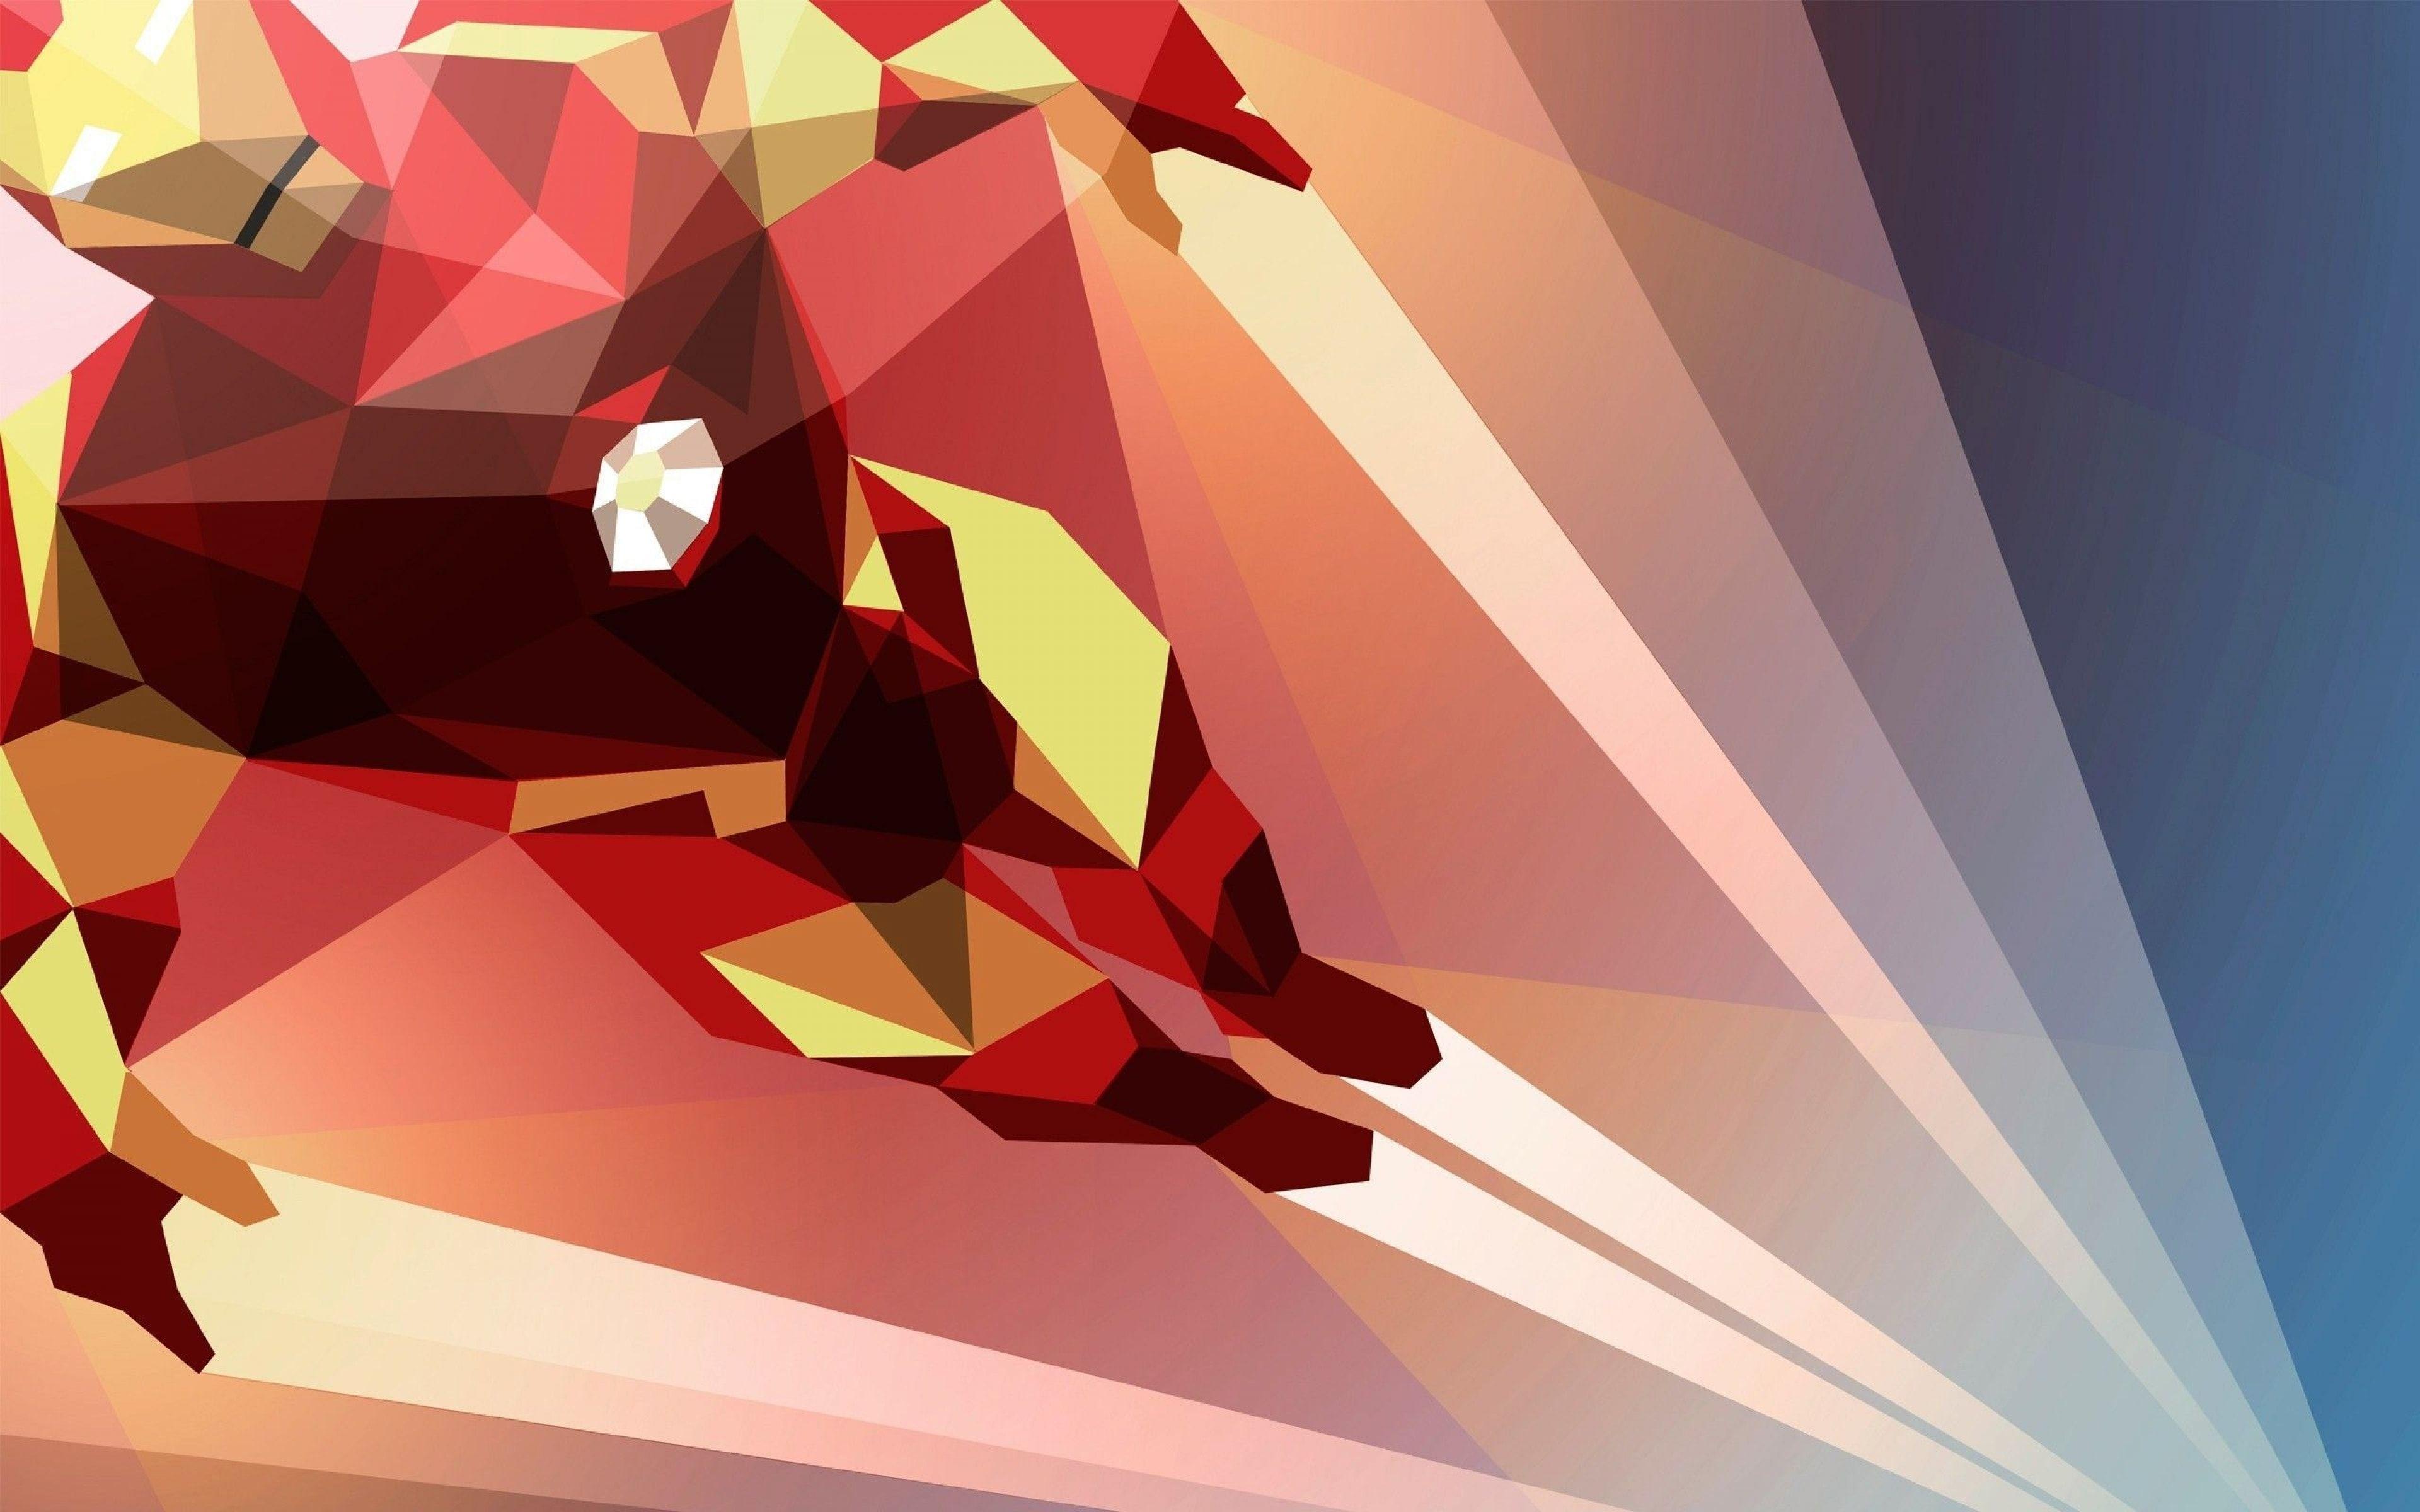 Great Wallpaper Macbook Superhero - ca20cb5378953fbf0abbc15783362b7e  Snapshot_931622.jpg